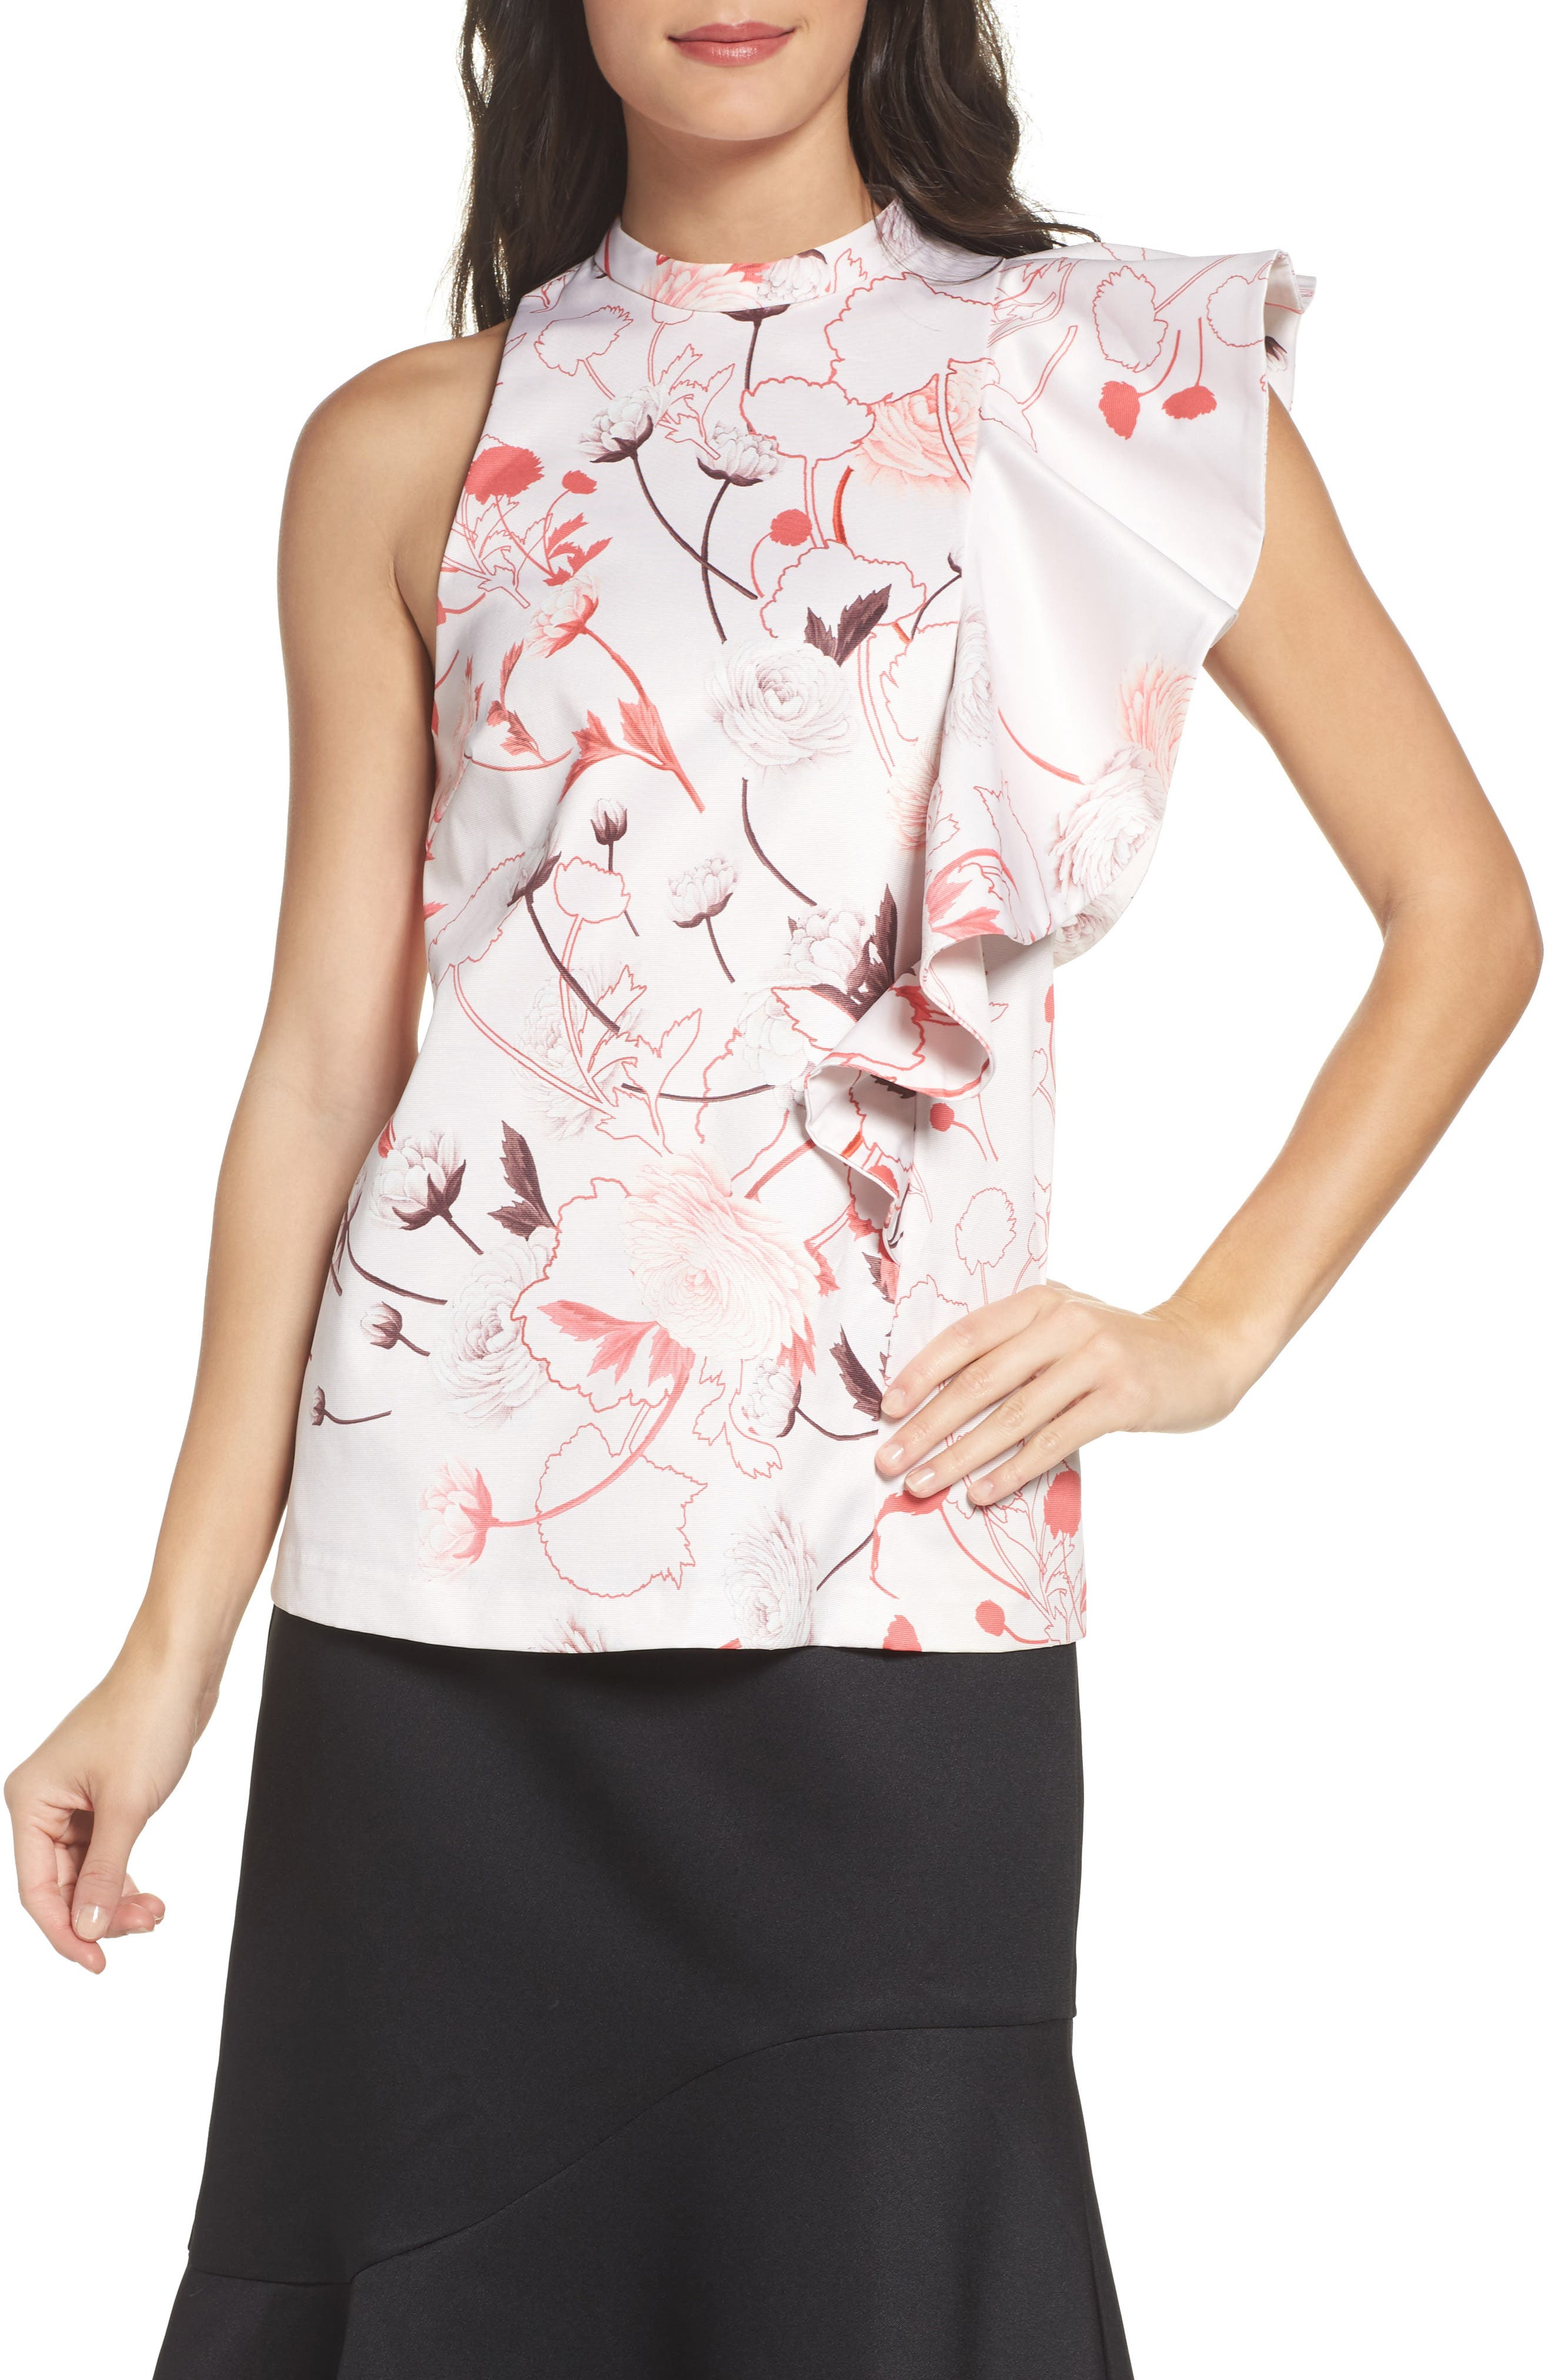 Amaya Ruffle Top,                         Main,                         color, Lace Print